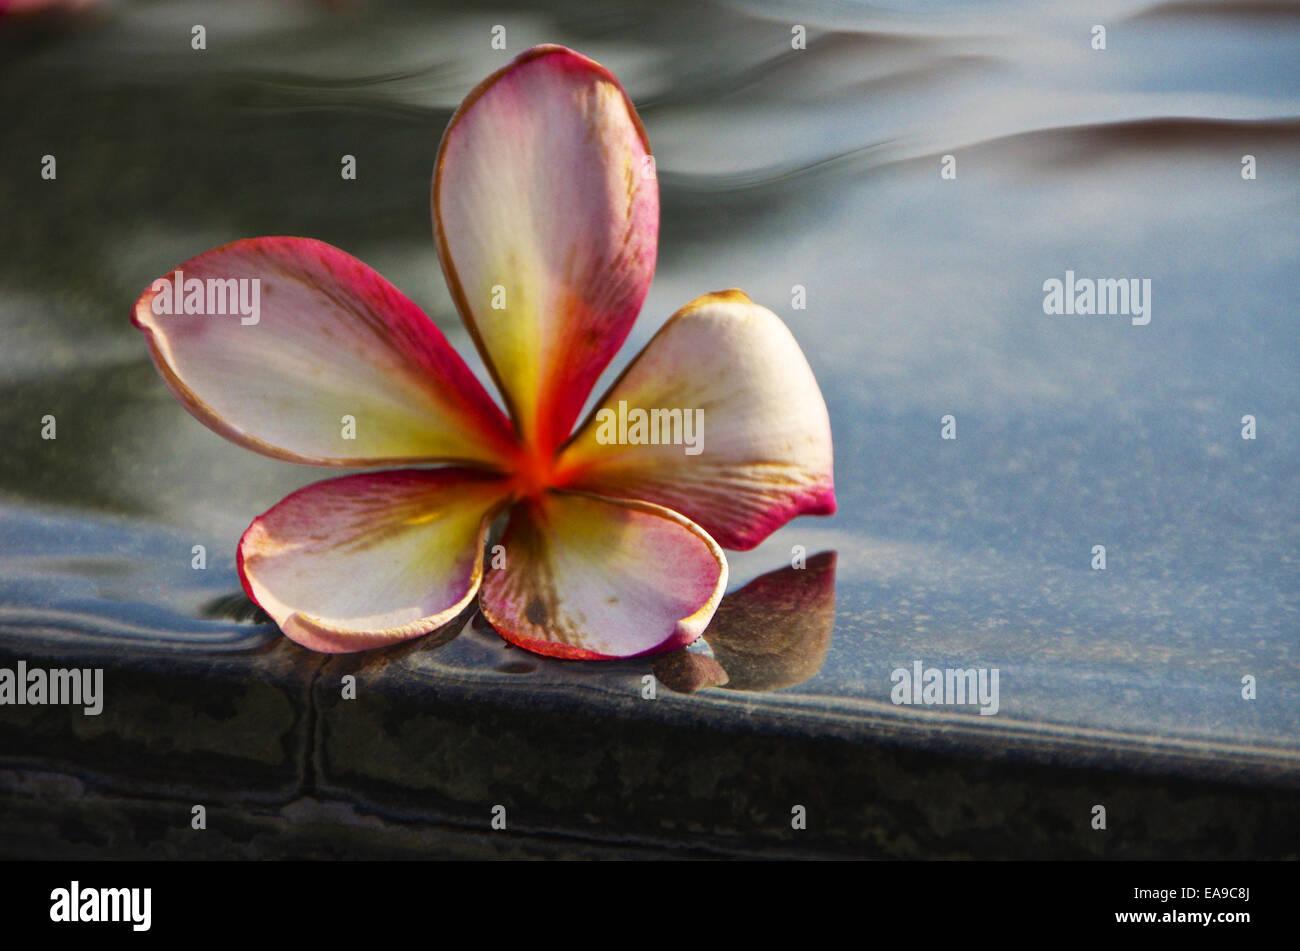 Fading Flower - Stock Image